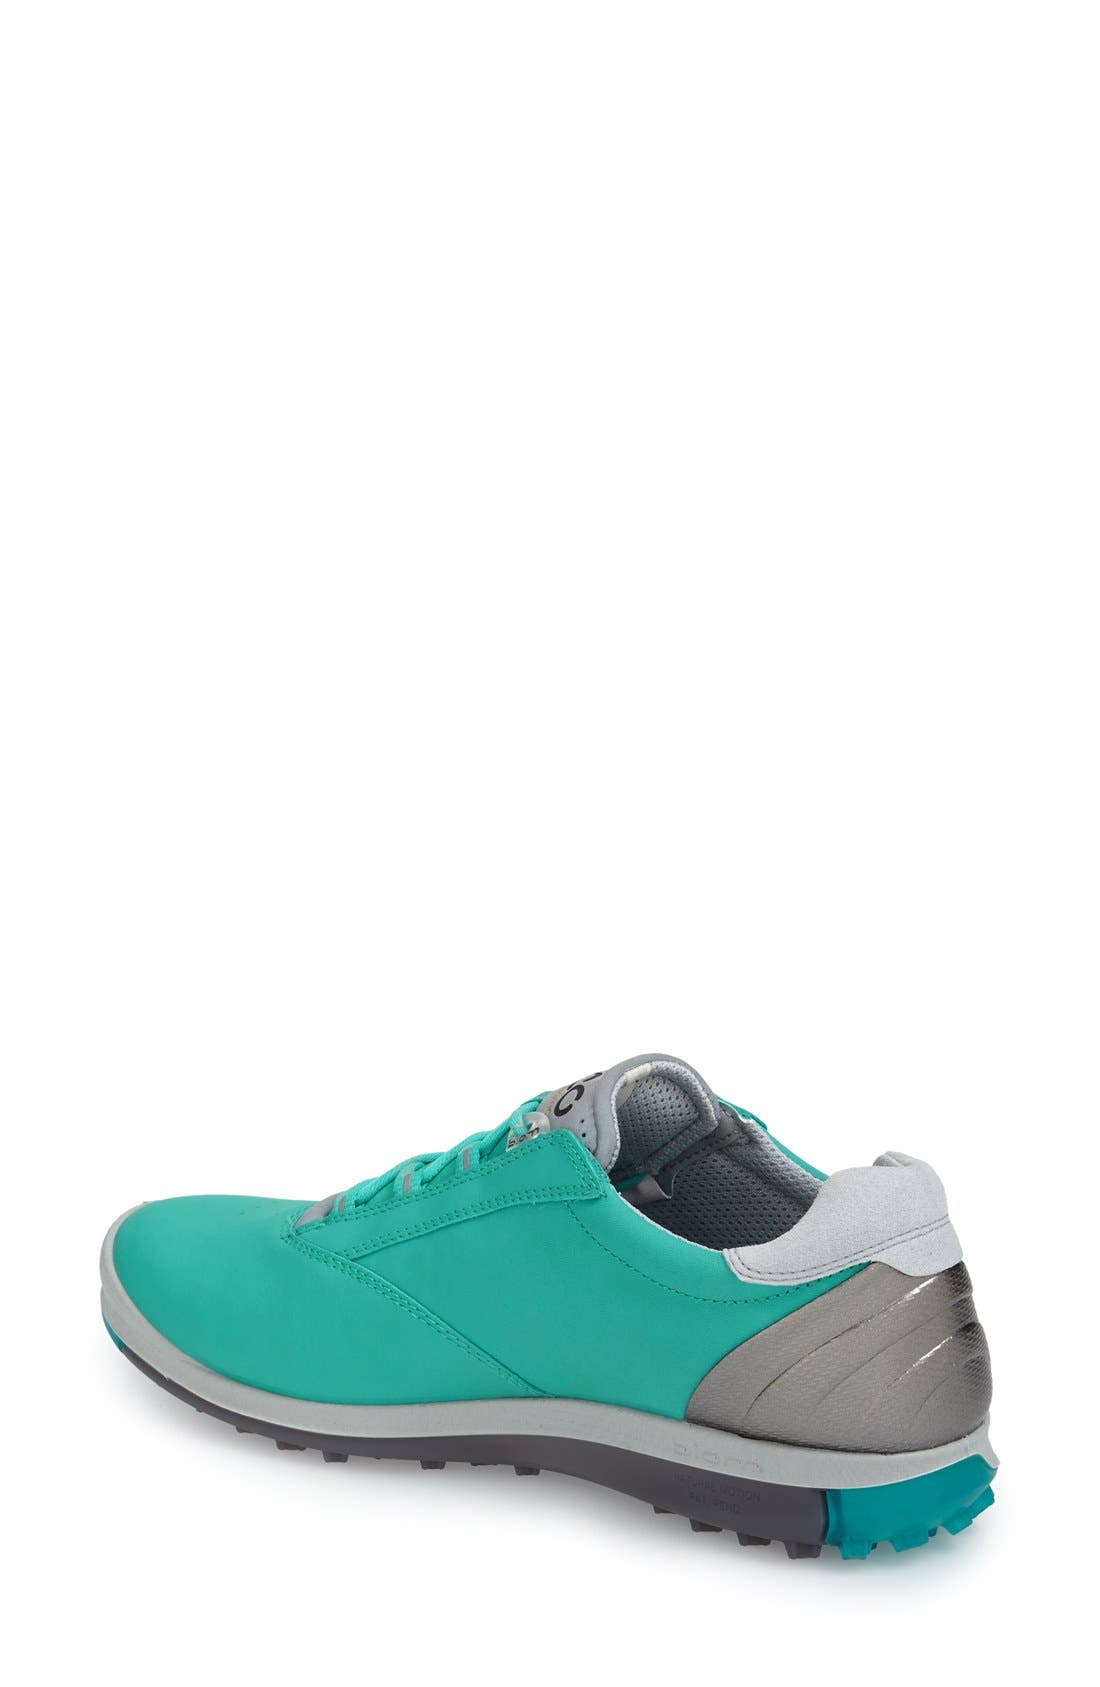 'BIOM' Hydromax<sup>®</sup> Waterproof Golf Shoe,                             Alternate thumbnail 23, color,